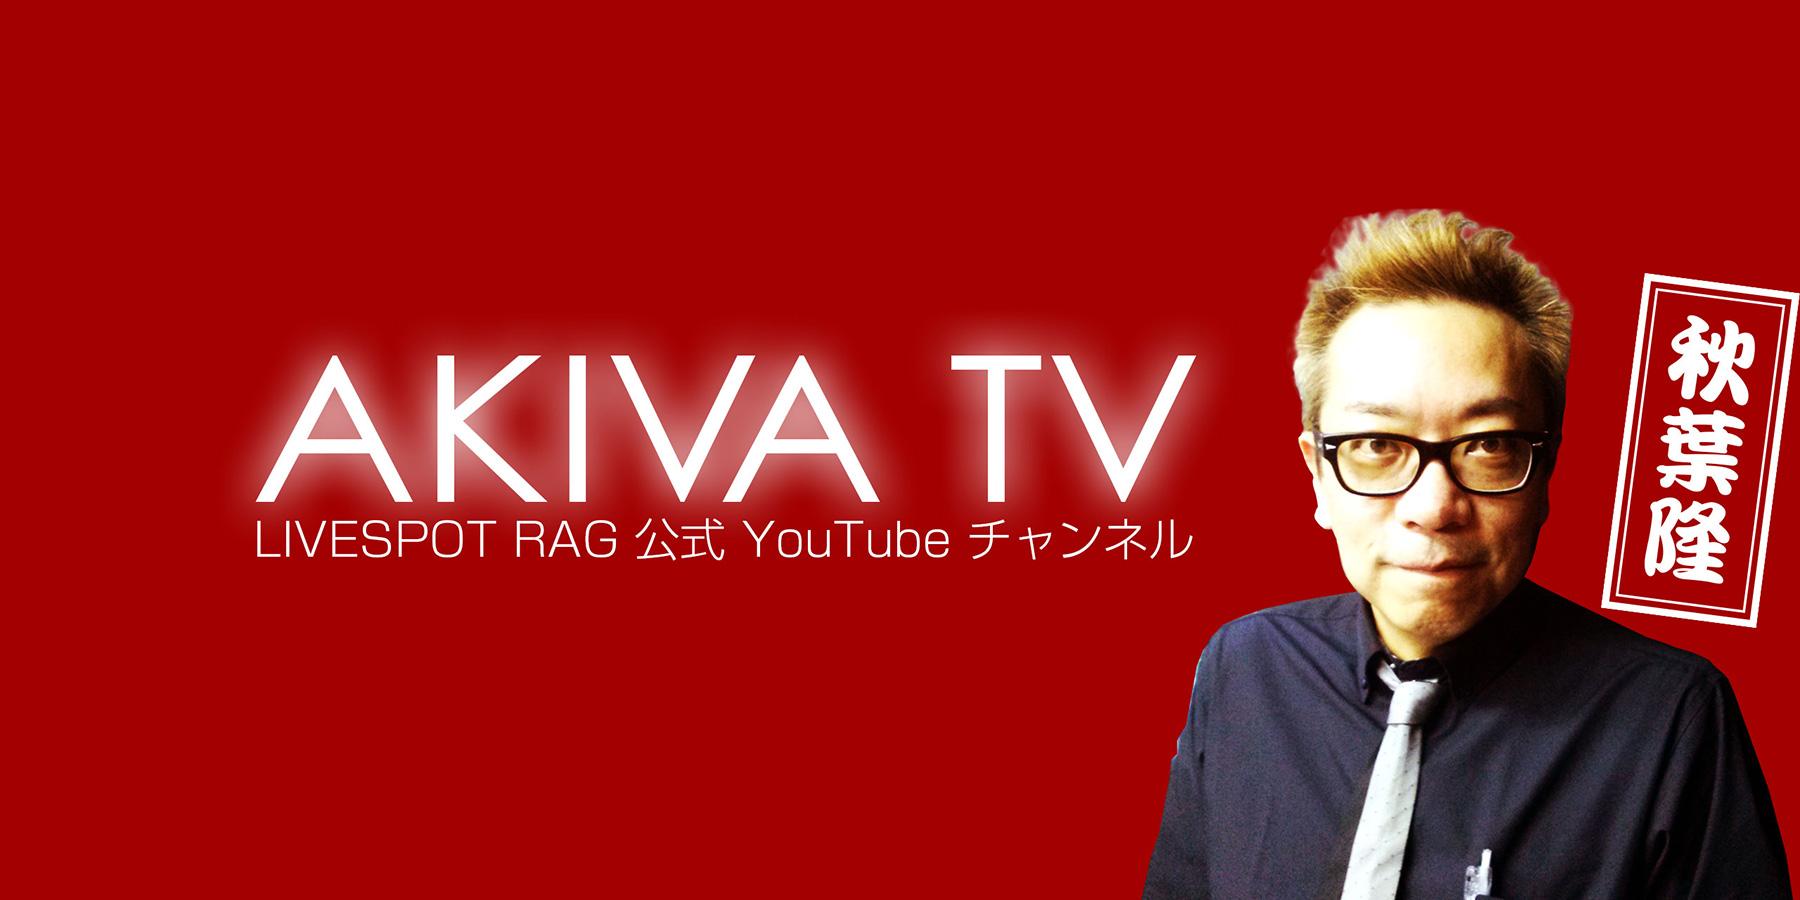 Live Spot RAG 公式 YouTubeチャンネル